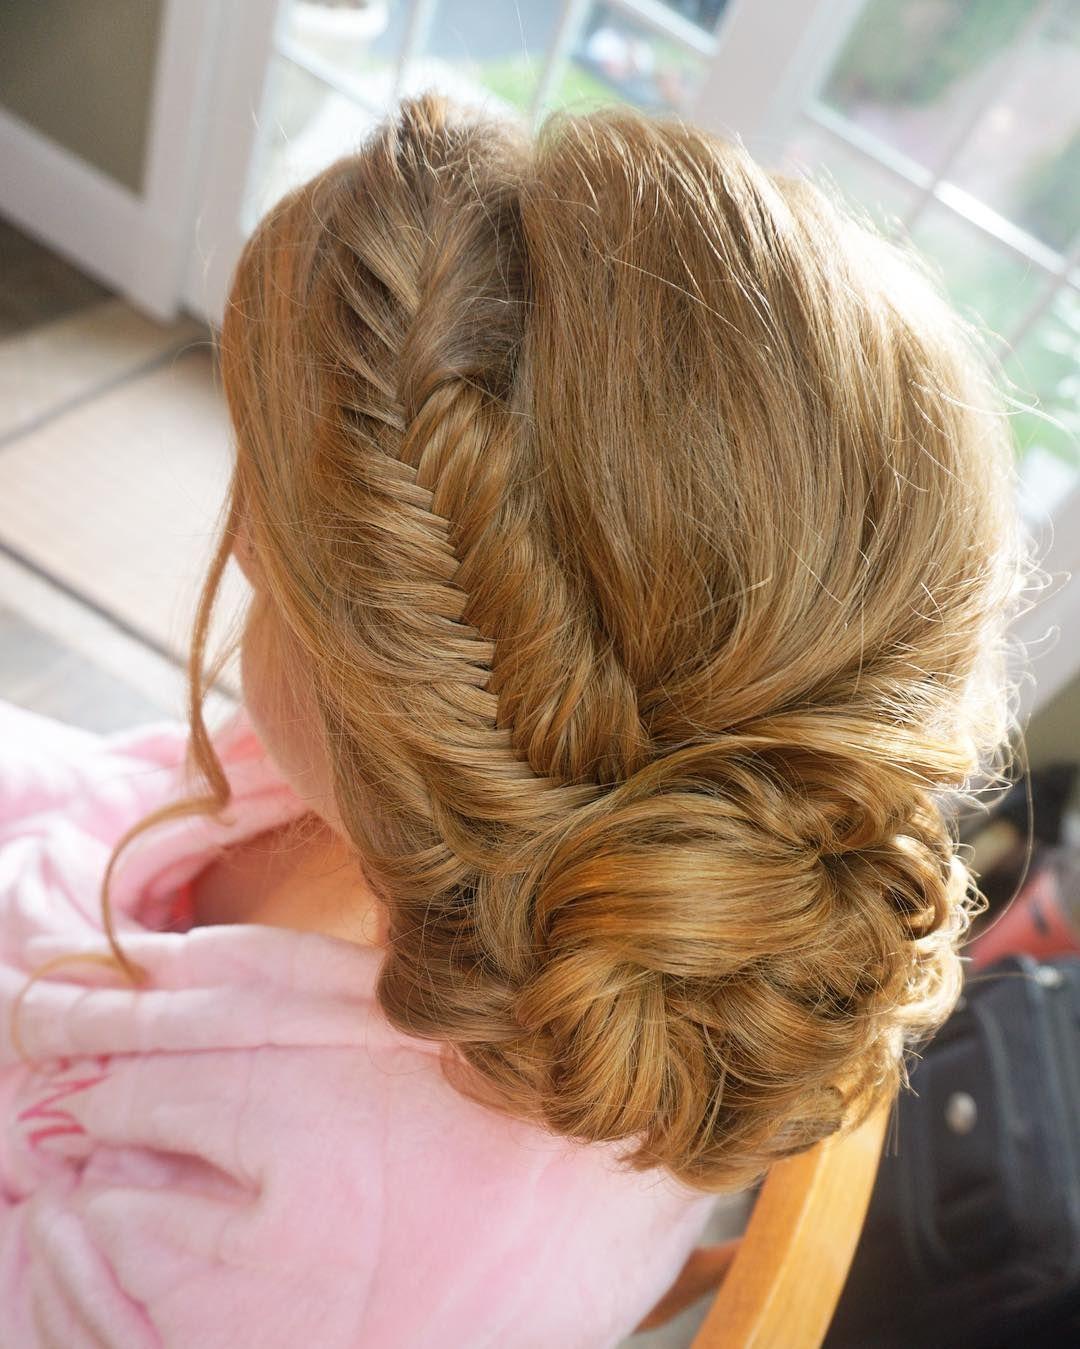 hair vibes today 🙌🏻 fishtail braid, redhair, wedding hair, wedding